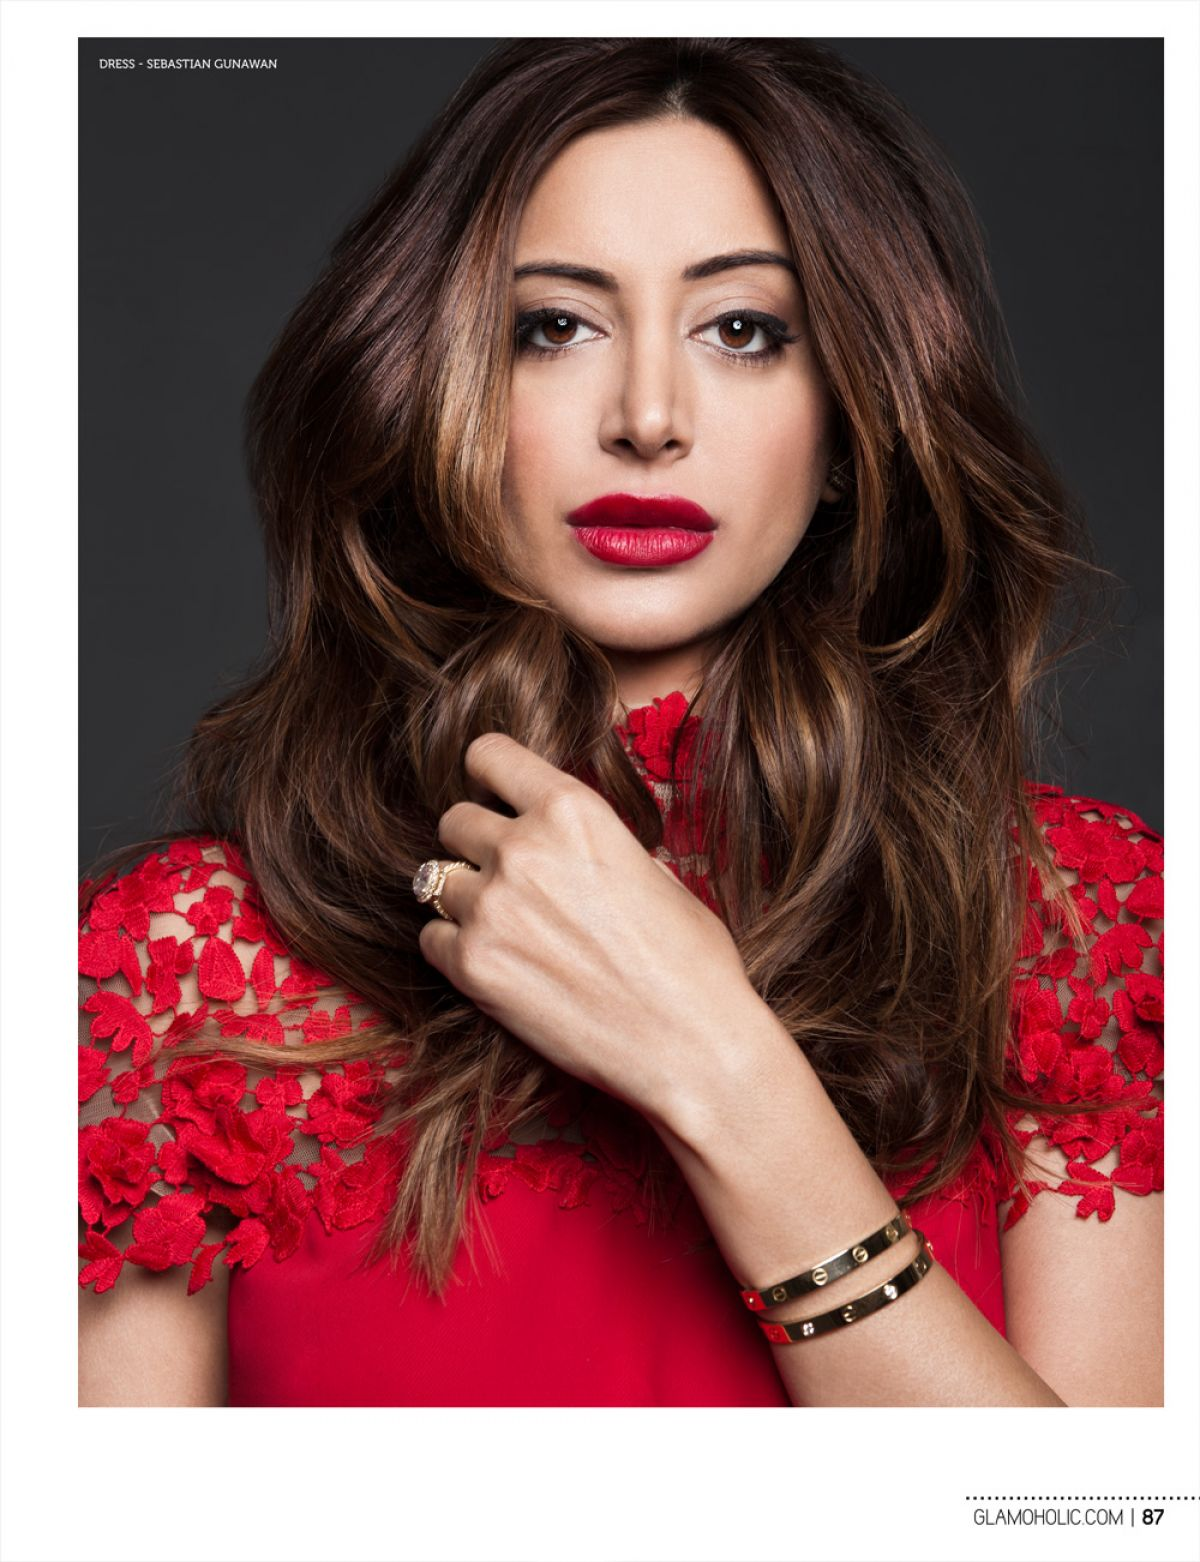 Noureen Dewulf In Glamoholic Magazine January 2015 Issue